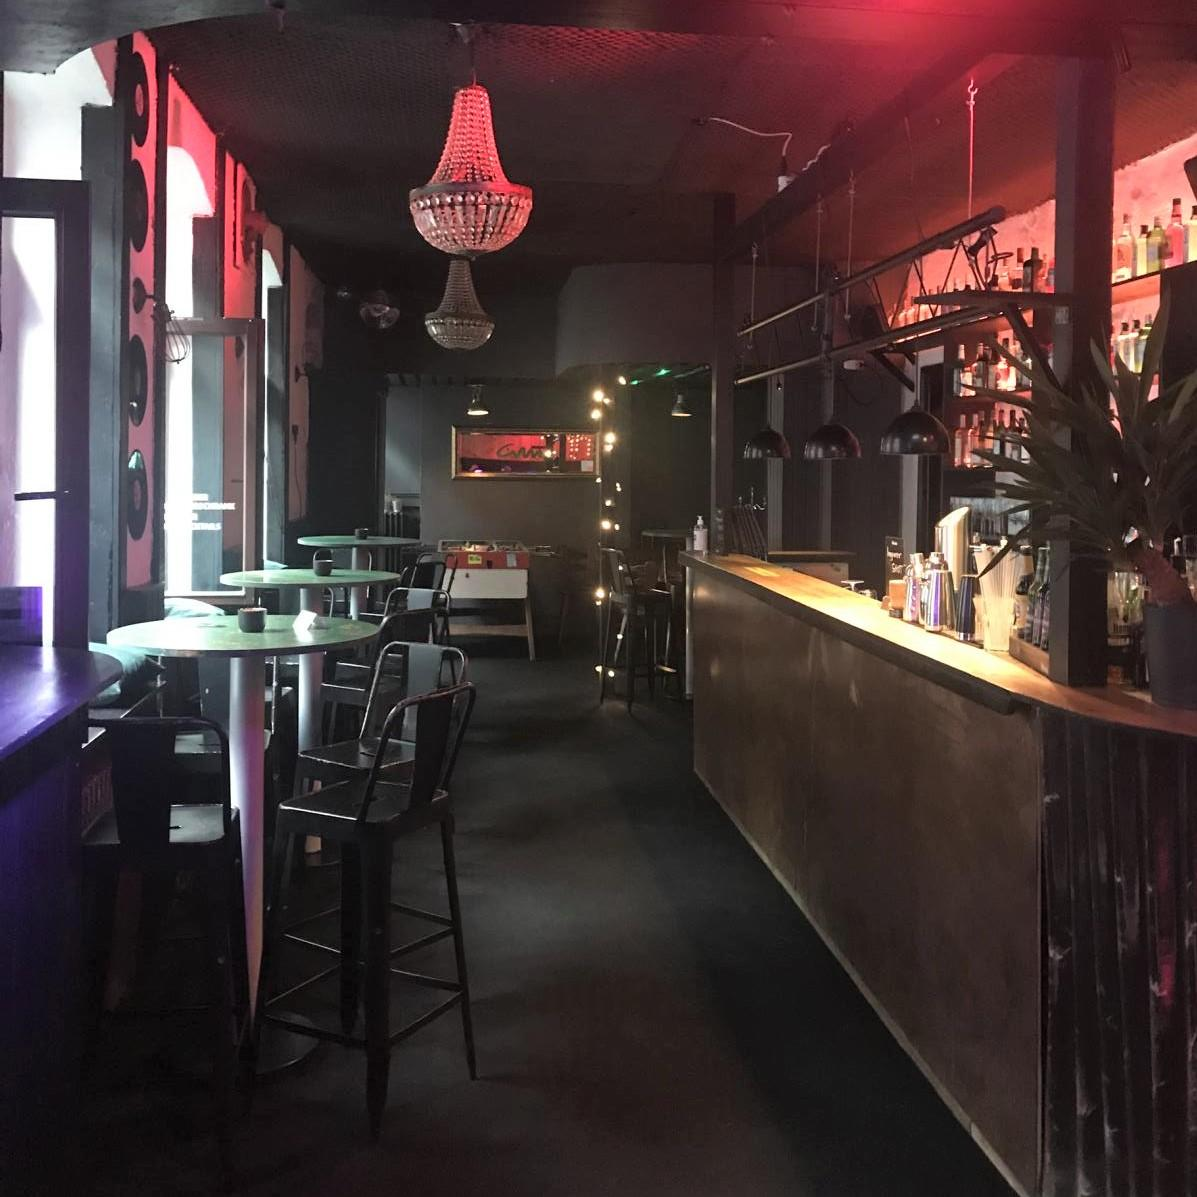 Style Hannover Lindwurm Linden 2 - Lindwurm - Bar & Bühne im Herzen Lindens